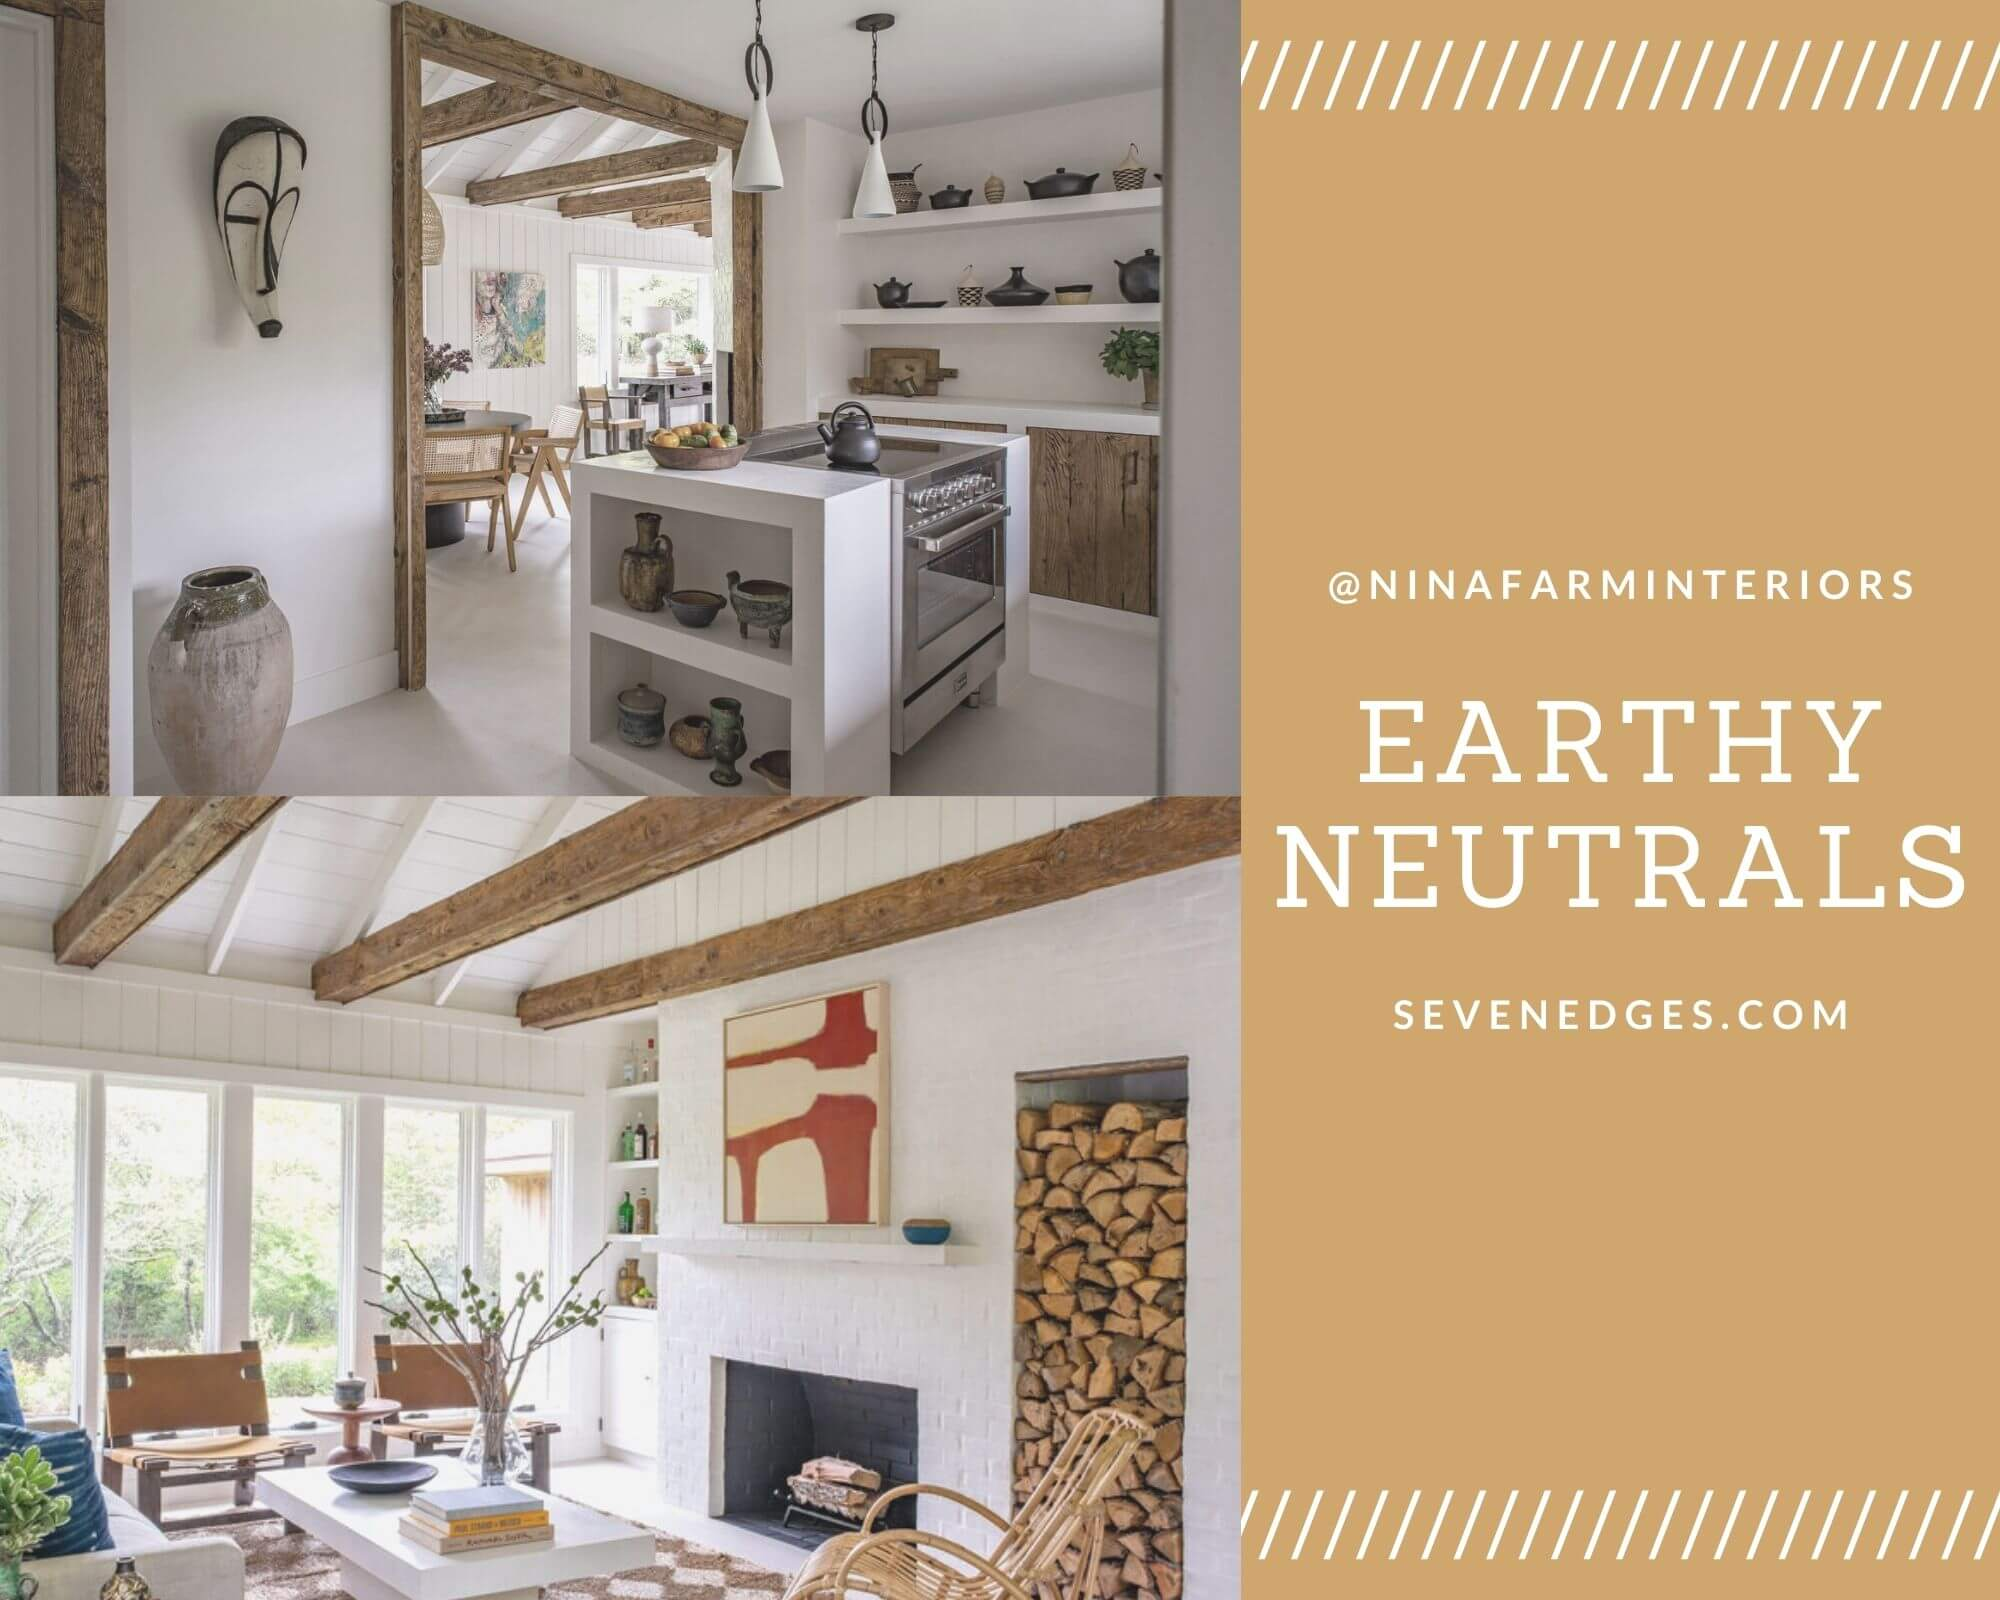 Earthy Neutrals from NinaFarmInteriors